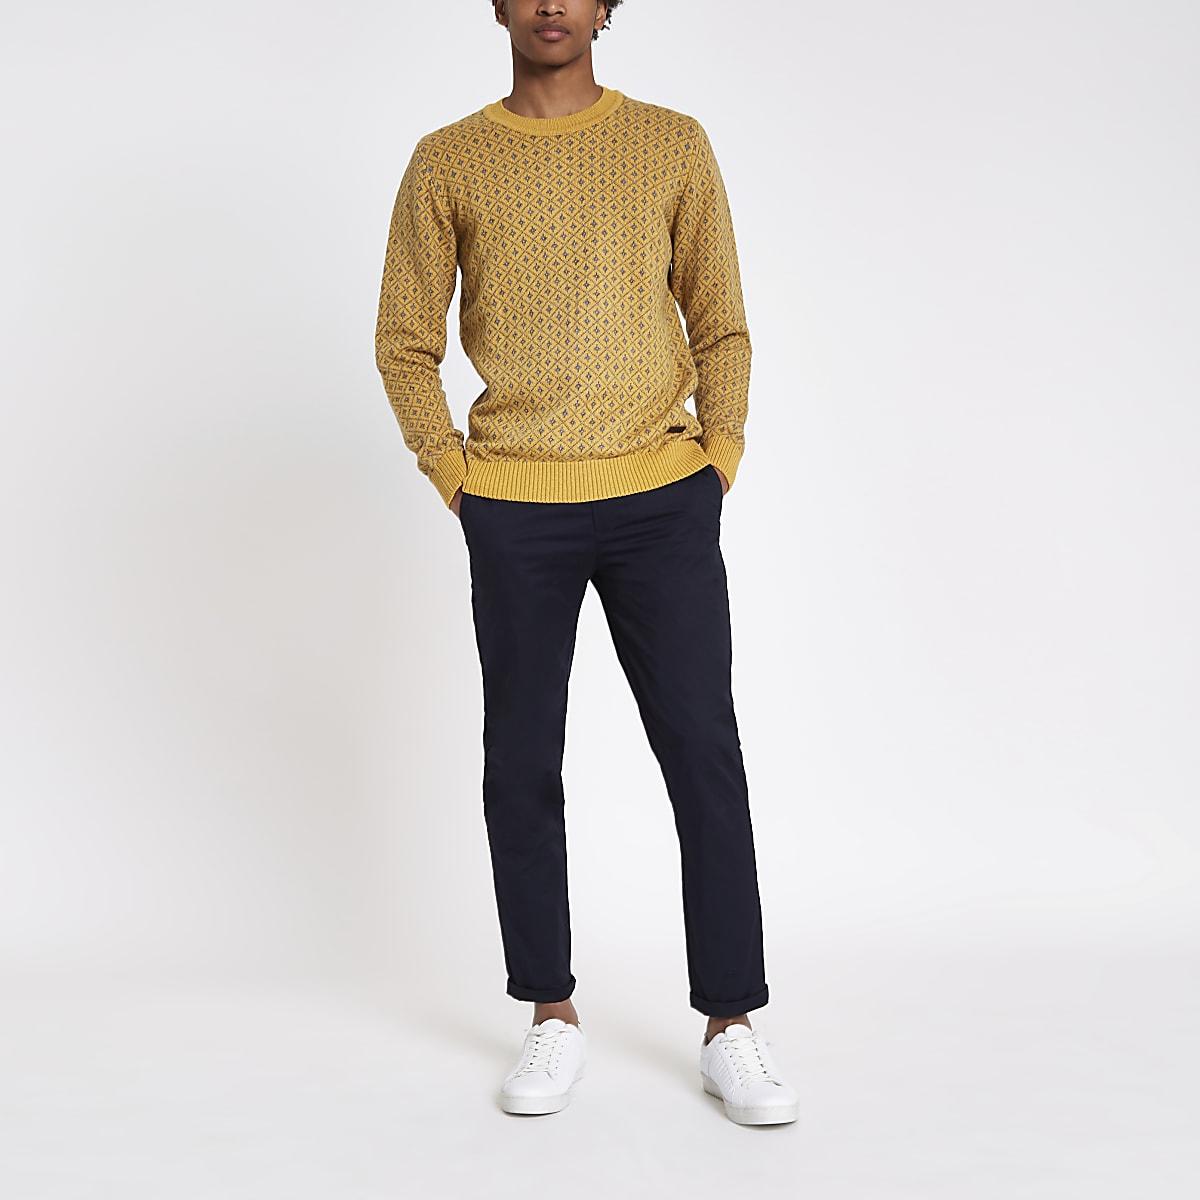 Pepe Jeans – Gelber, bedruckter Pullover